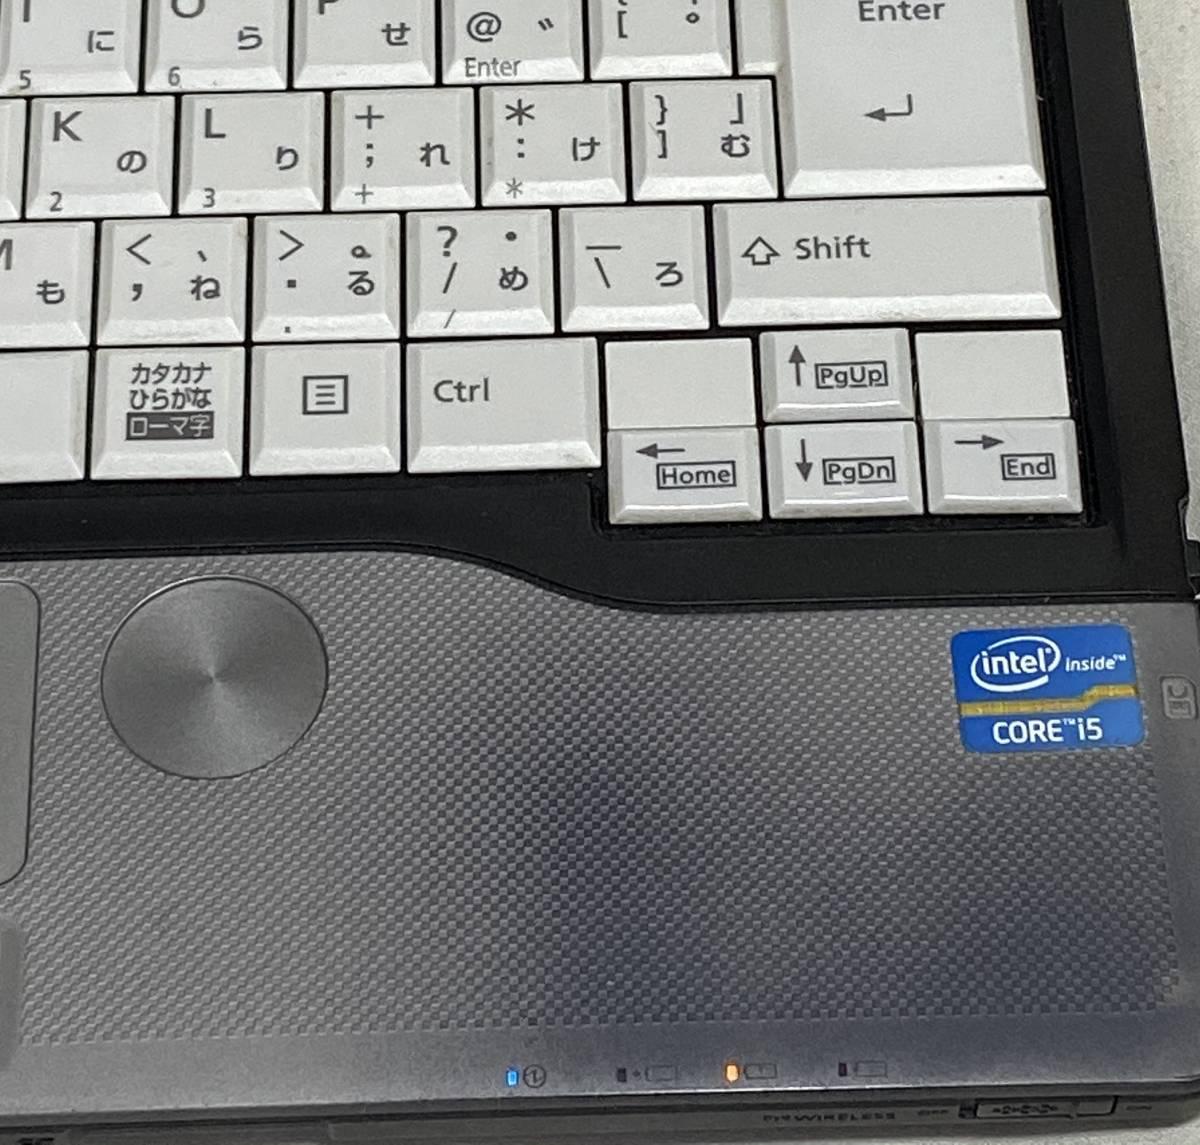 【中古/塗装難有】富士通 LIFEBOOK S762/G 13.3型 / Windows10 Pro/Core i5-3340M/メモリ4GB/120GB SSD/ドライブ有/WPS Office/カメラ認識_画像4